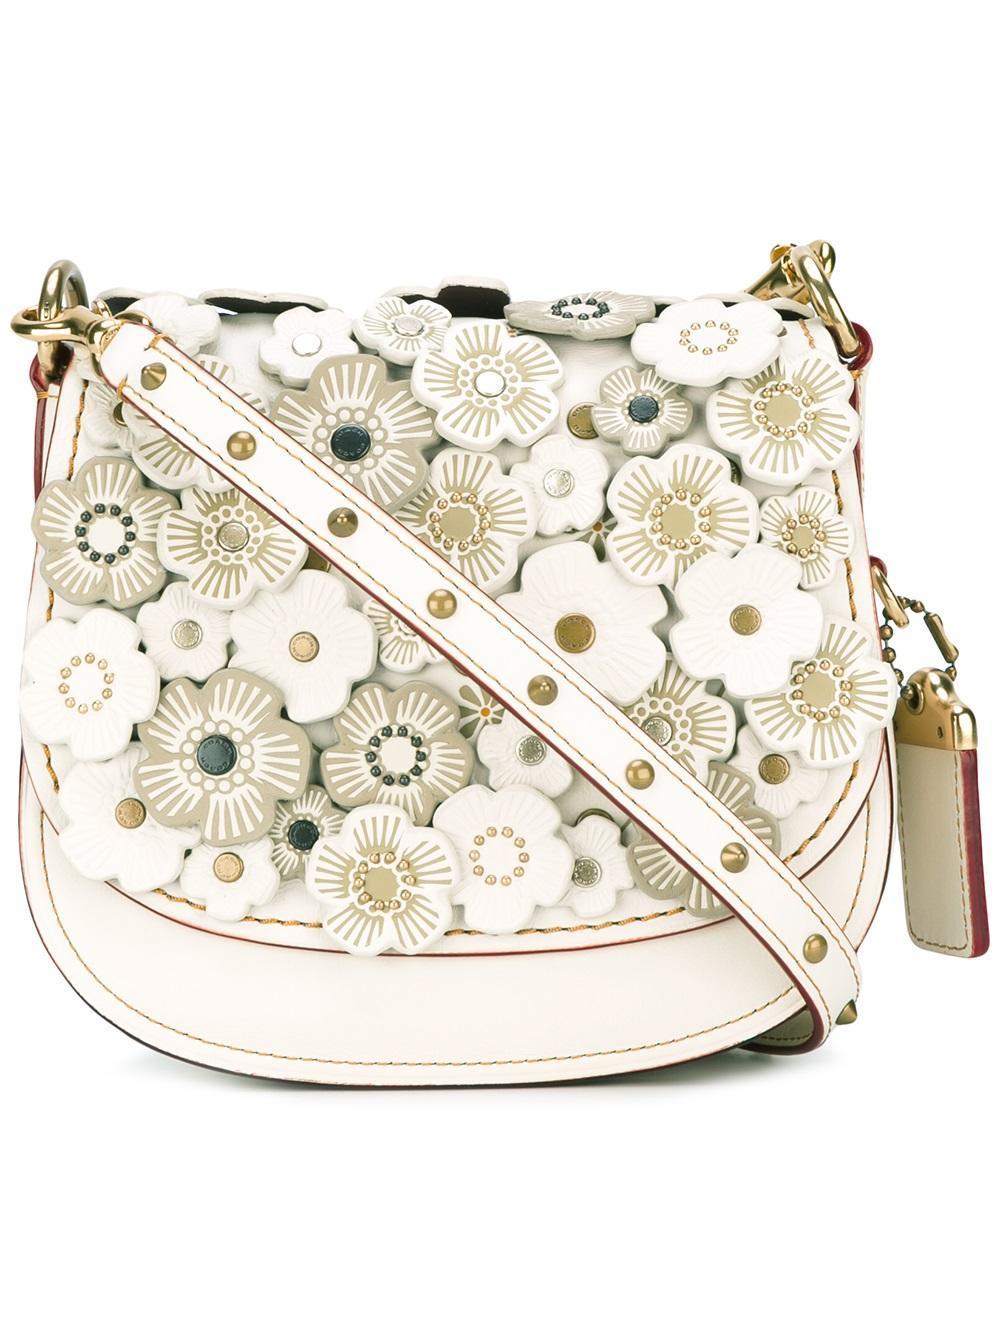 Lyst - COACH Flower Embellished Crossbody Bag 7e371d3fd4541